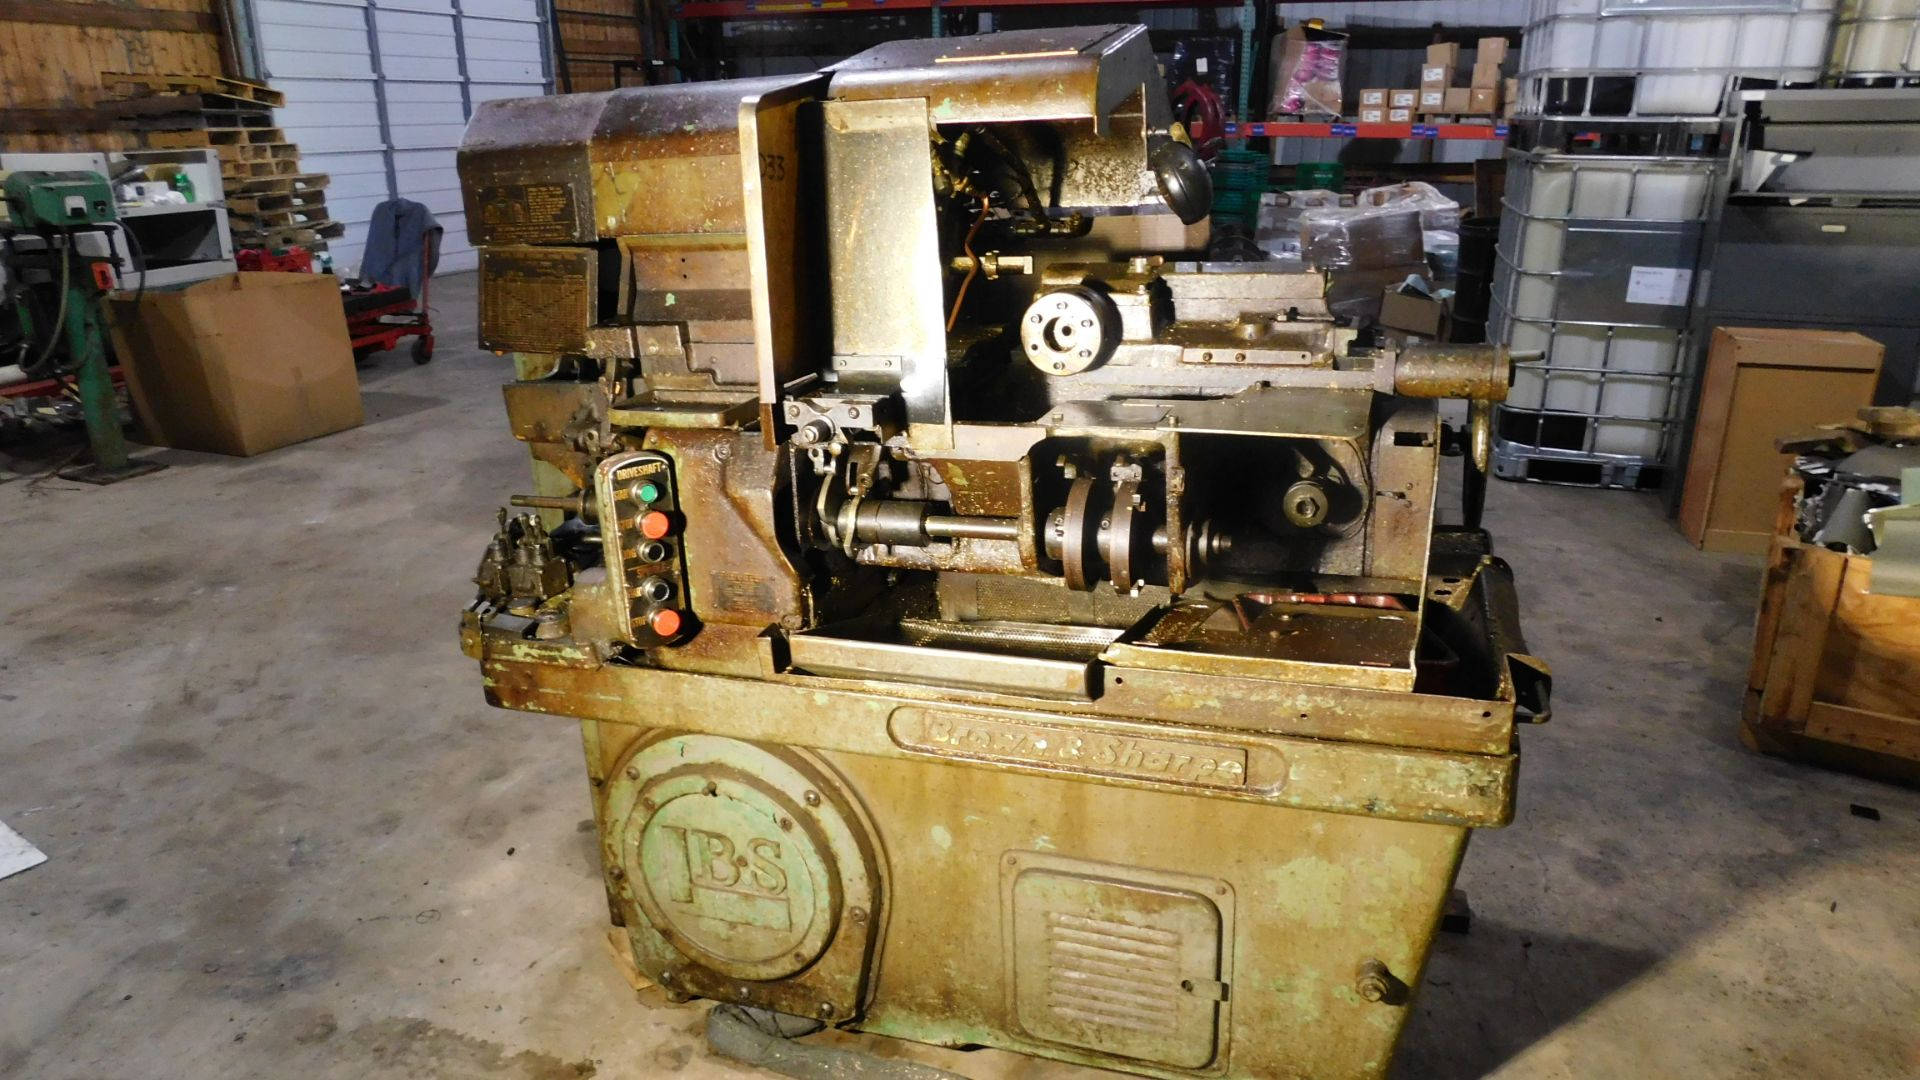 Lotto 16 - Brown & Sharpe #2 Ultramatic Screw Machine, s/n 542-2-4889, 3/4 In. Capacity